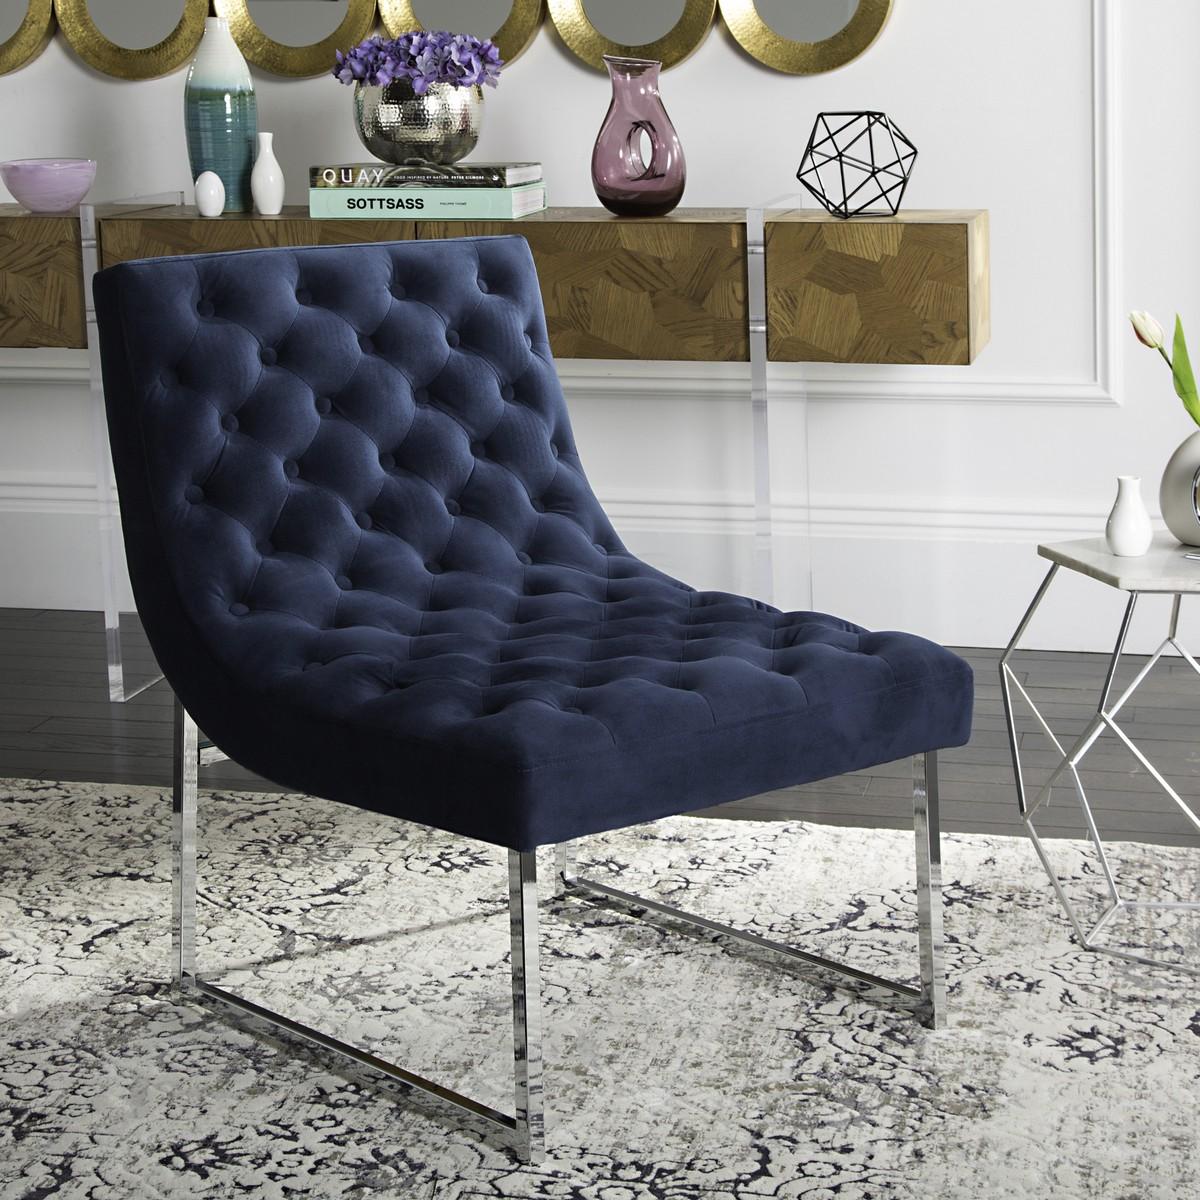 Fabulous Fox6283B Accent Chairs Furniture By Safavieh Machost Co Dining Chair Design Ideas Machostcouk